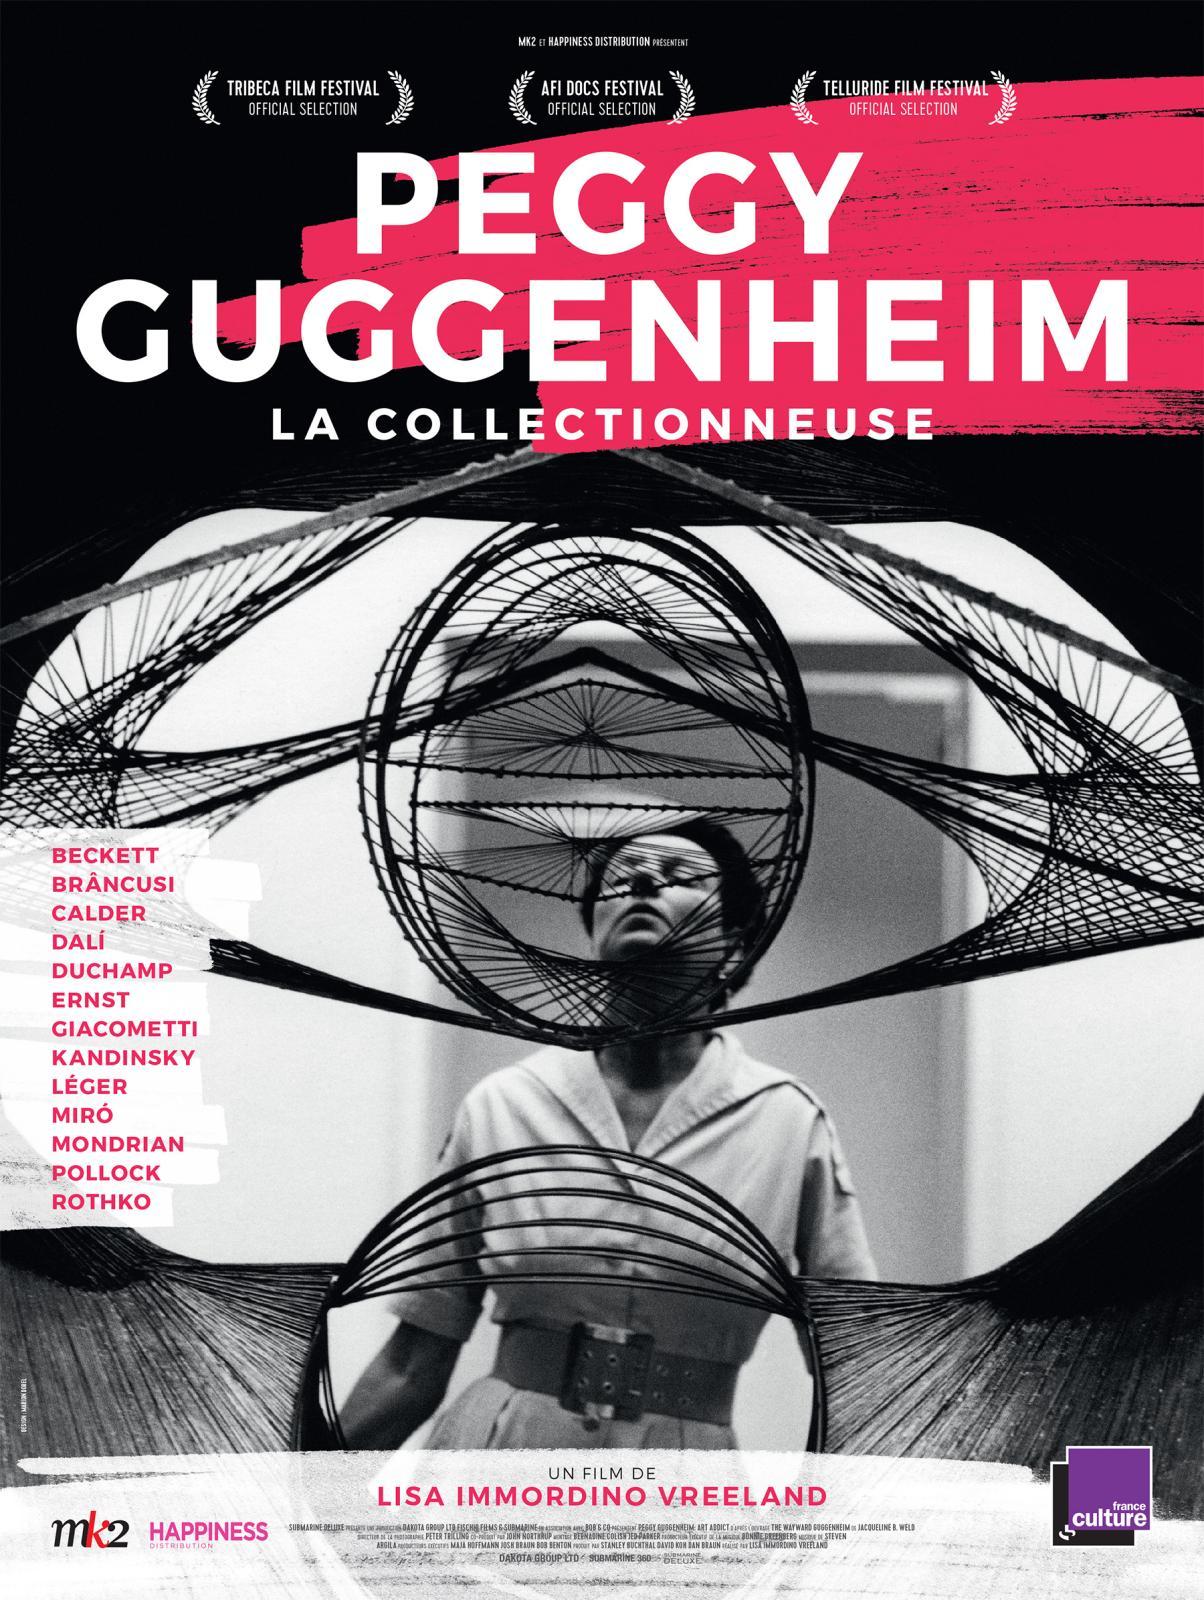 Peggy Guggenheim: la collectionneuse, DVD chez BlaqOut, 1h36, réalisation Lisa Immordino Vreeland.